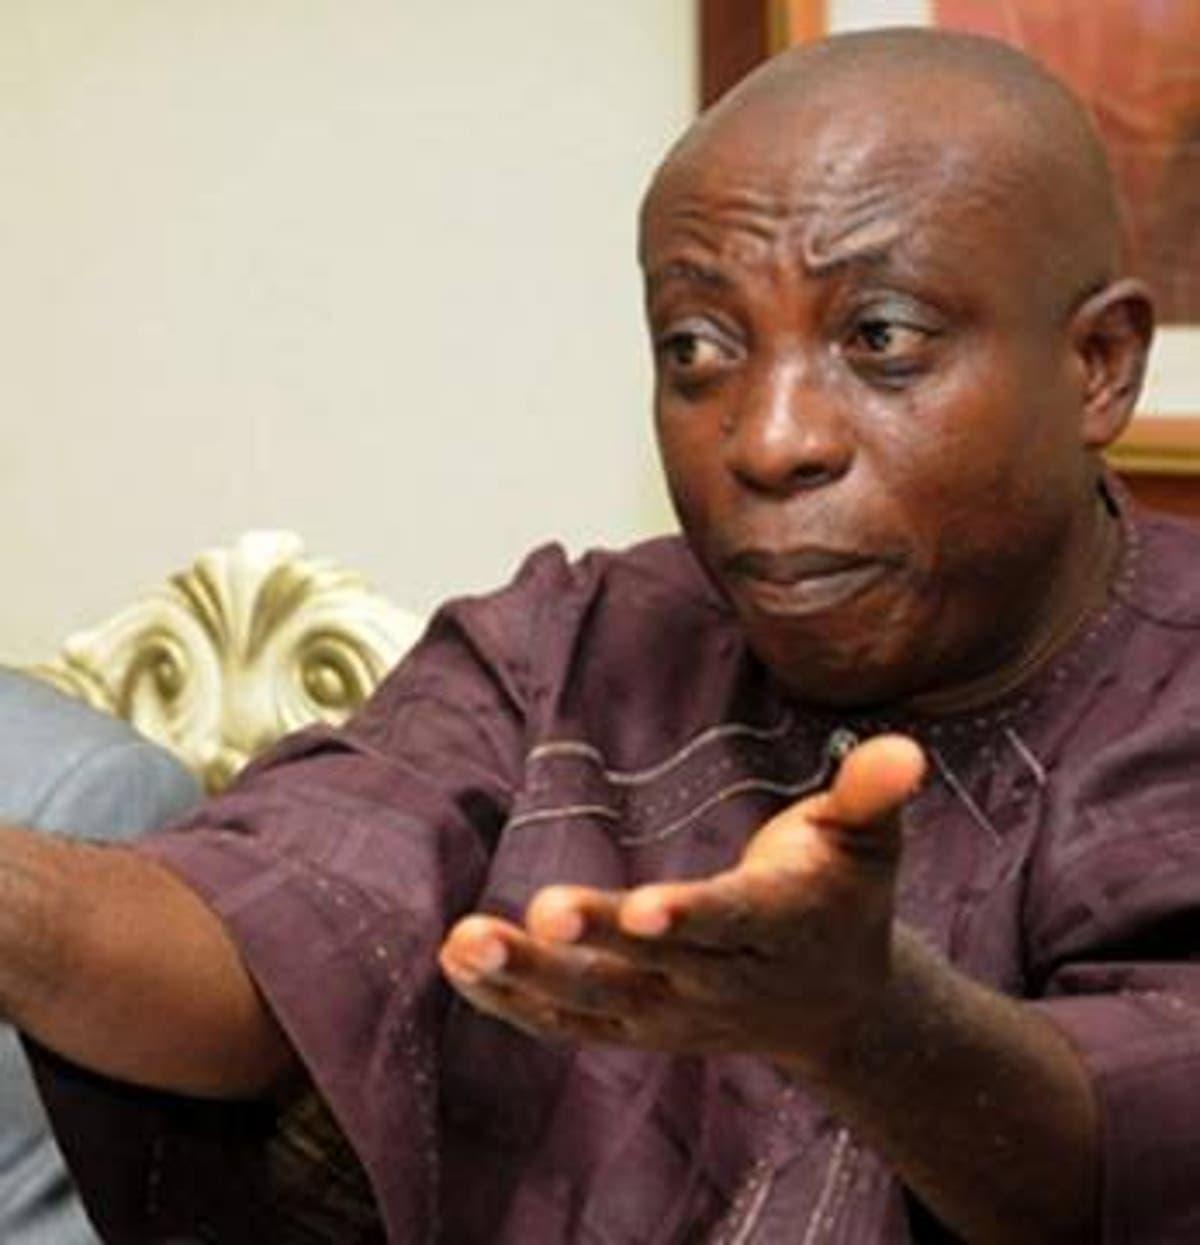 Biafra nationals'll uphold UN's laws, conventions—Uwazurike - Vanguard News